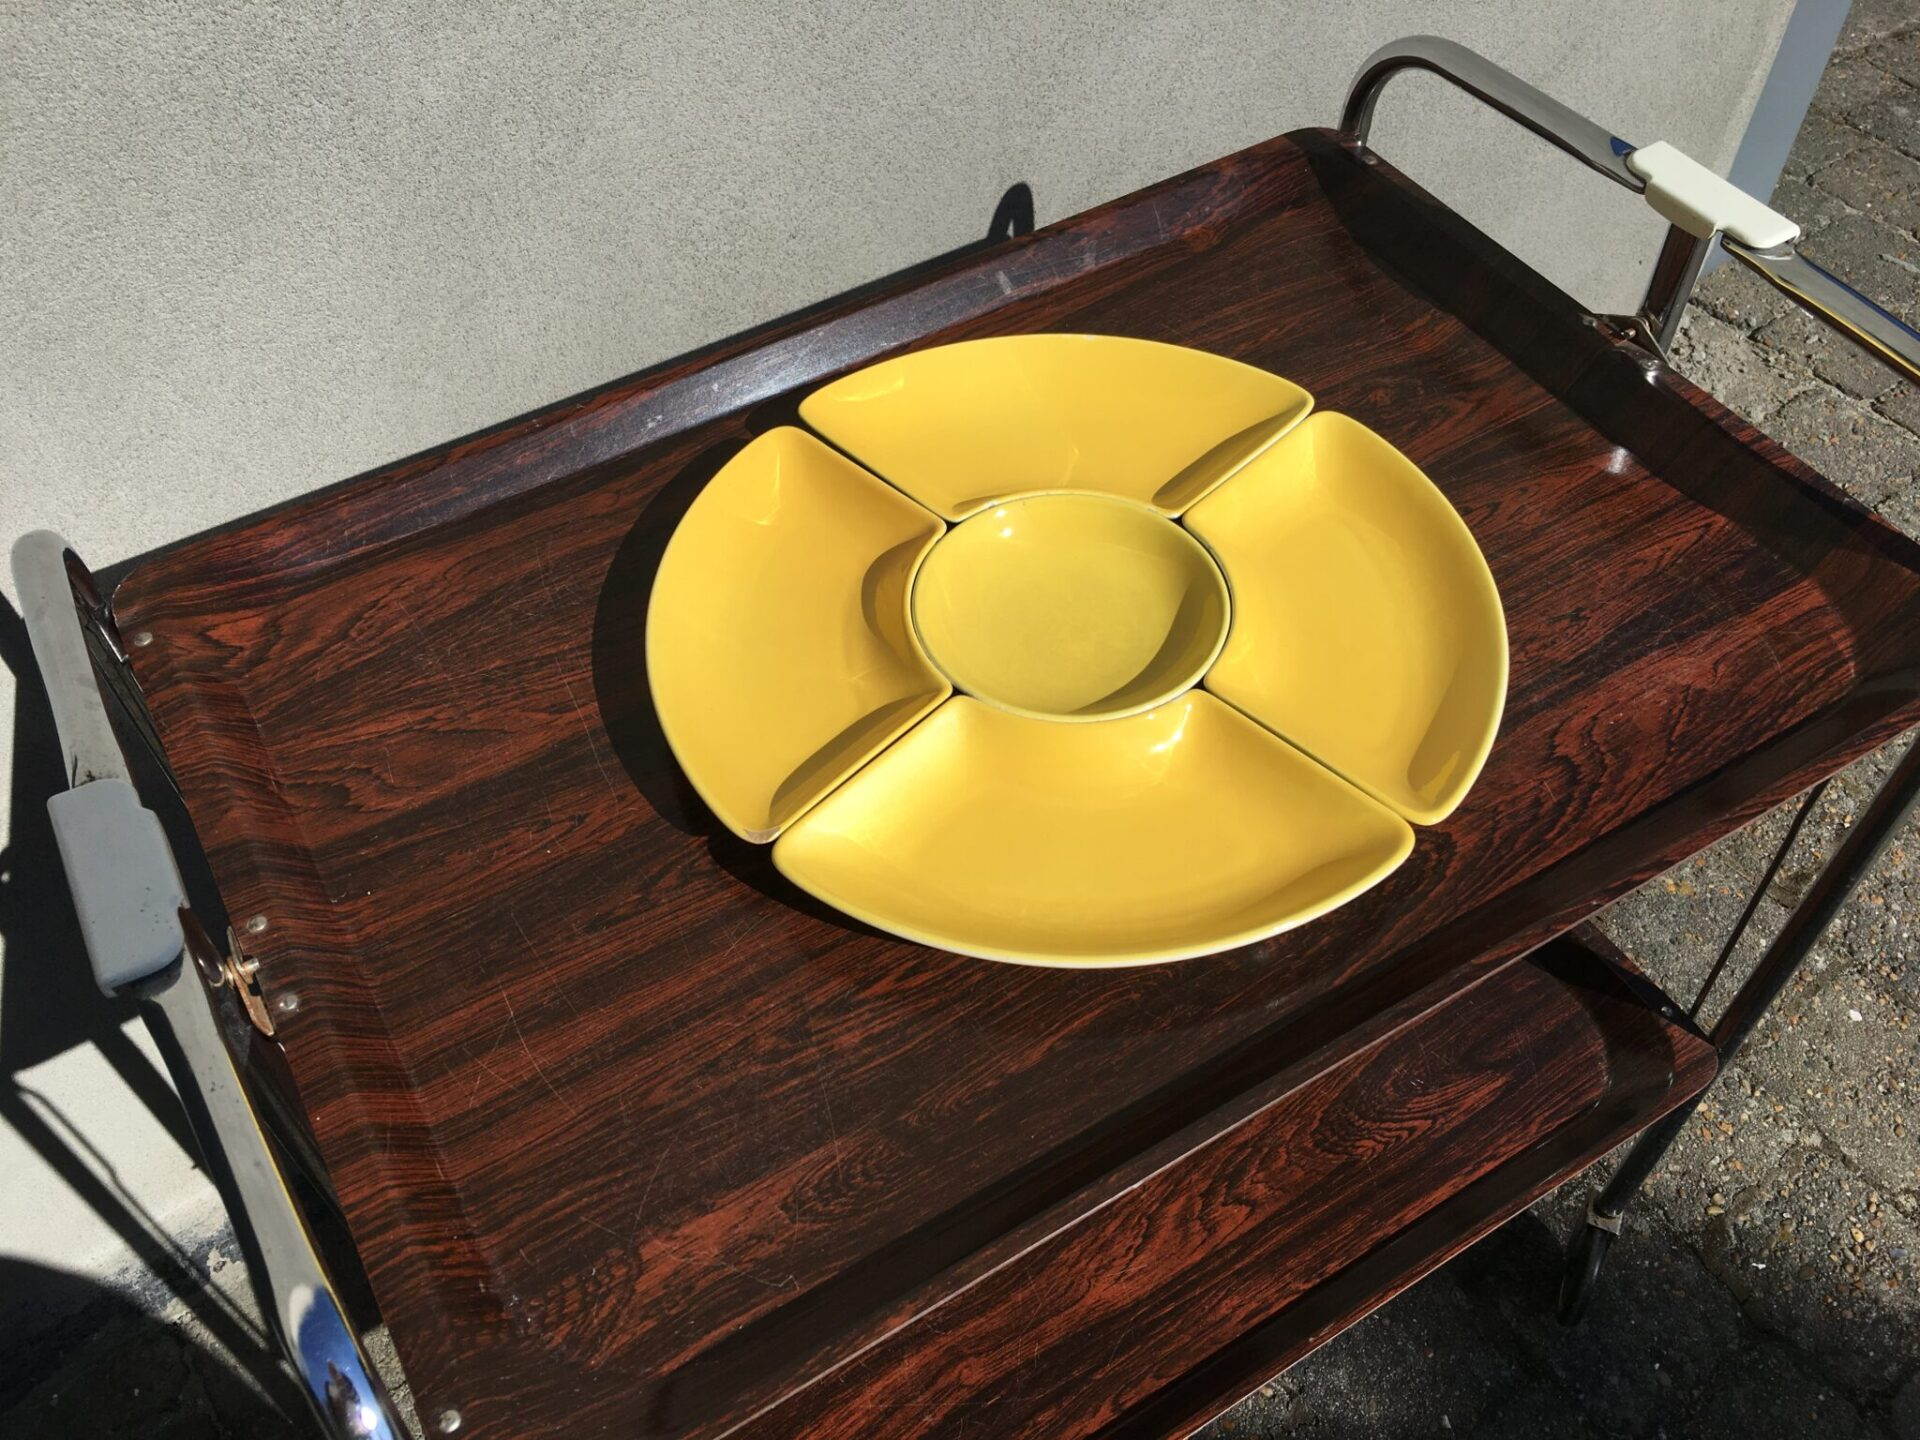 Carbaret fad, løse skåle, Aluminia Confetti (små afslag), pris 200 kr